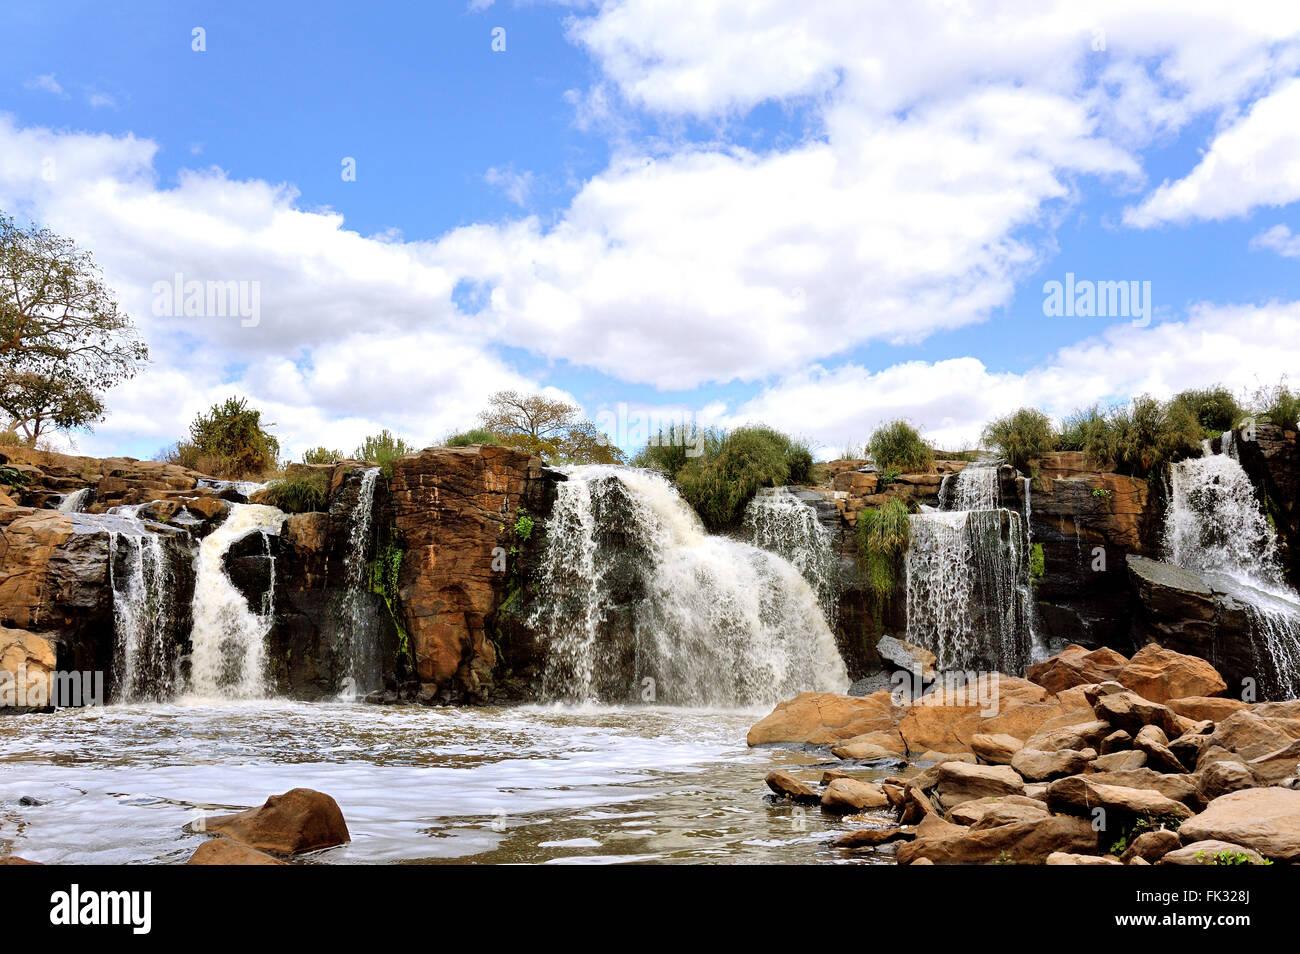 Catorce cae bajo un cielo azul, vista panorámica, Kenya Imagen De Stock